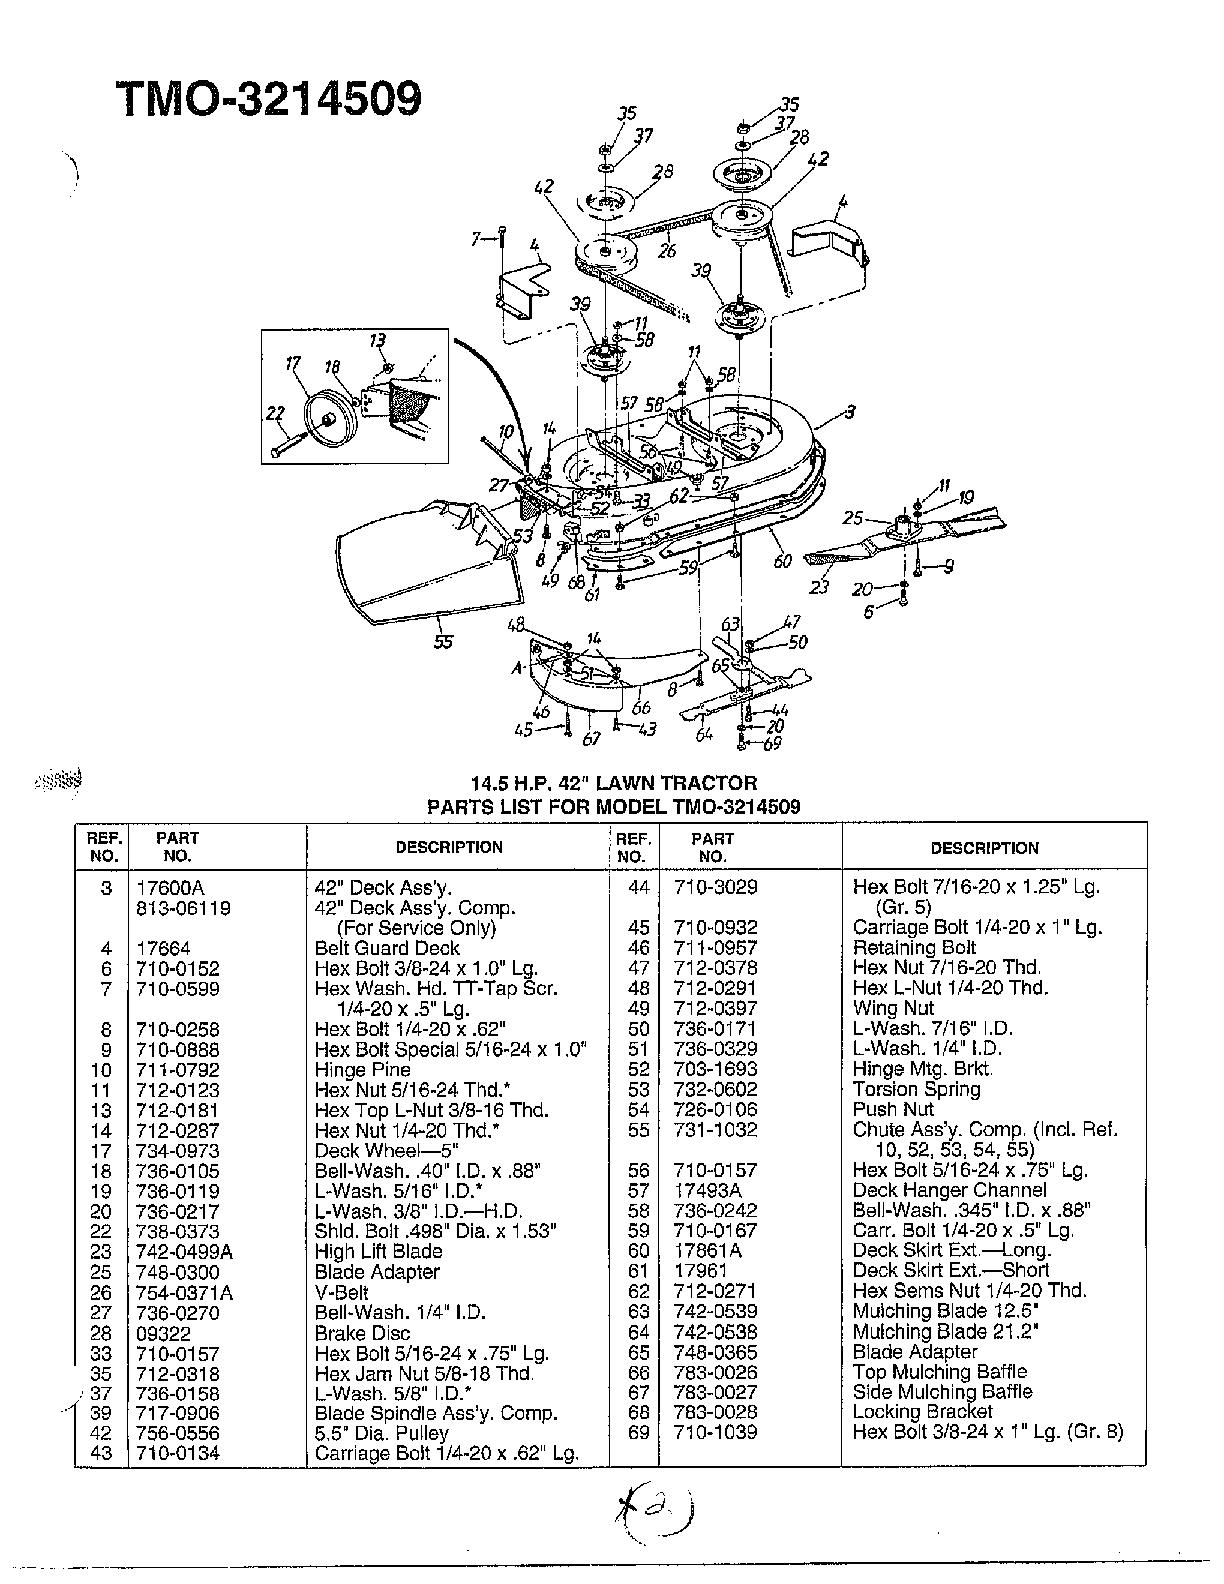 Mtd Lawn Mower Wiring Diagram | Wiring Diagram - Mtd Riding Lawn Mower Wiring Diagram